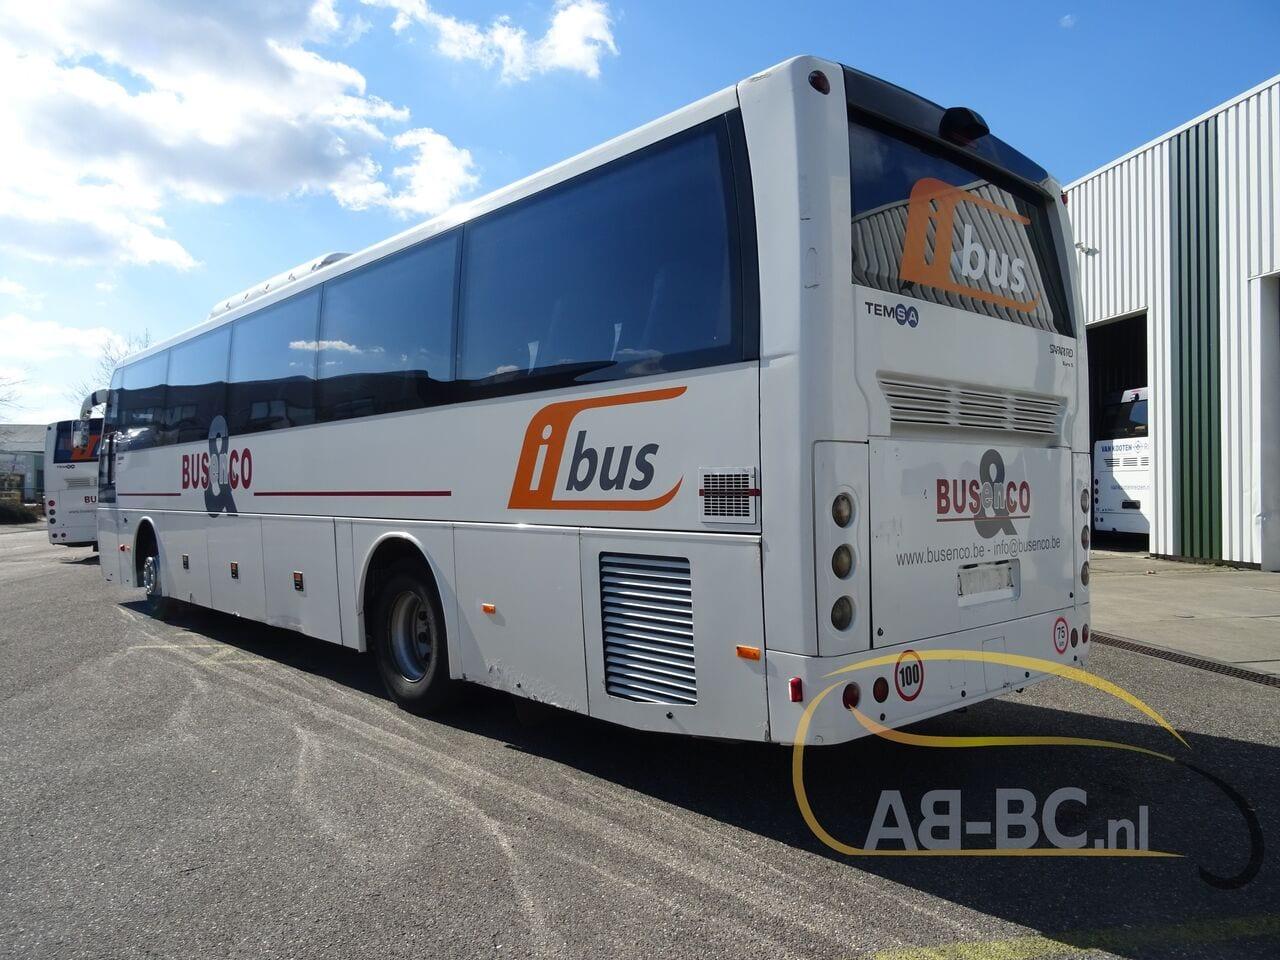 coach-busTEMSA-Safari-RD-53-Seats-DAF-Motor-12-mtr---1616166638419677086_big_1bbfaa73a994e1c67dff1dafc73093e0--21031917053743807500